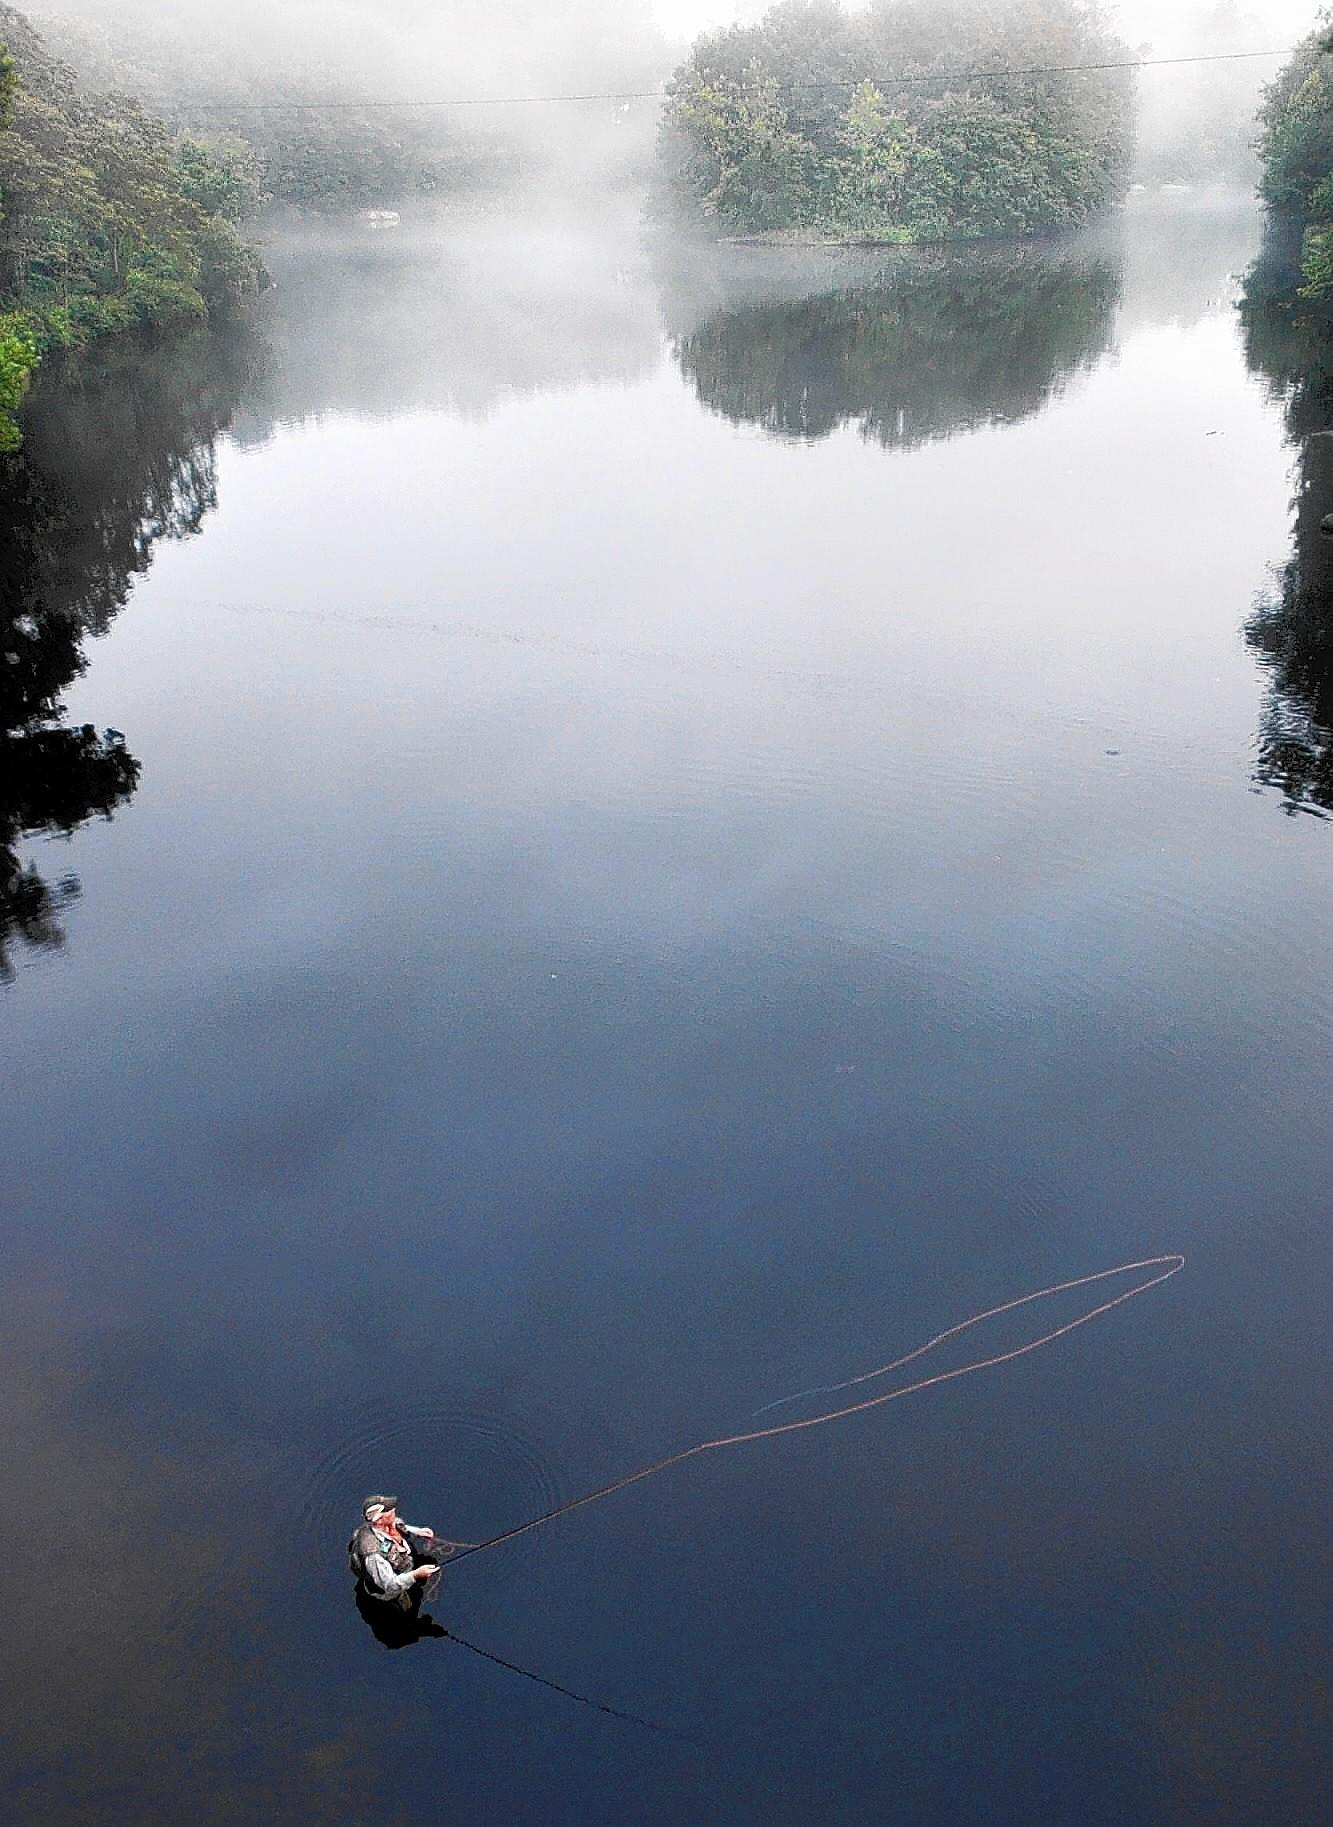 Farmington river a fly fishing mecca tribunedigital for Farmington river fly fishing